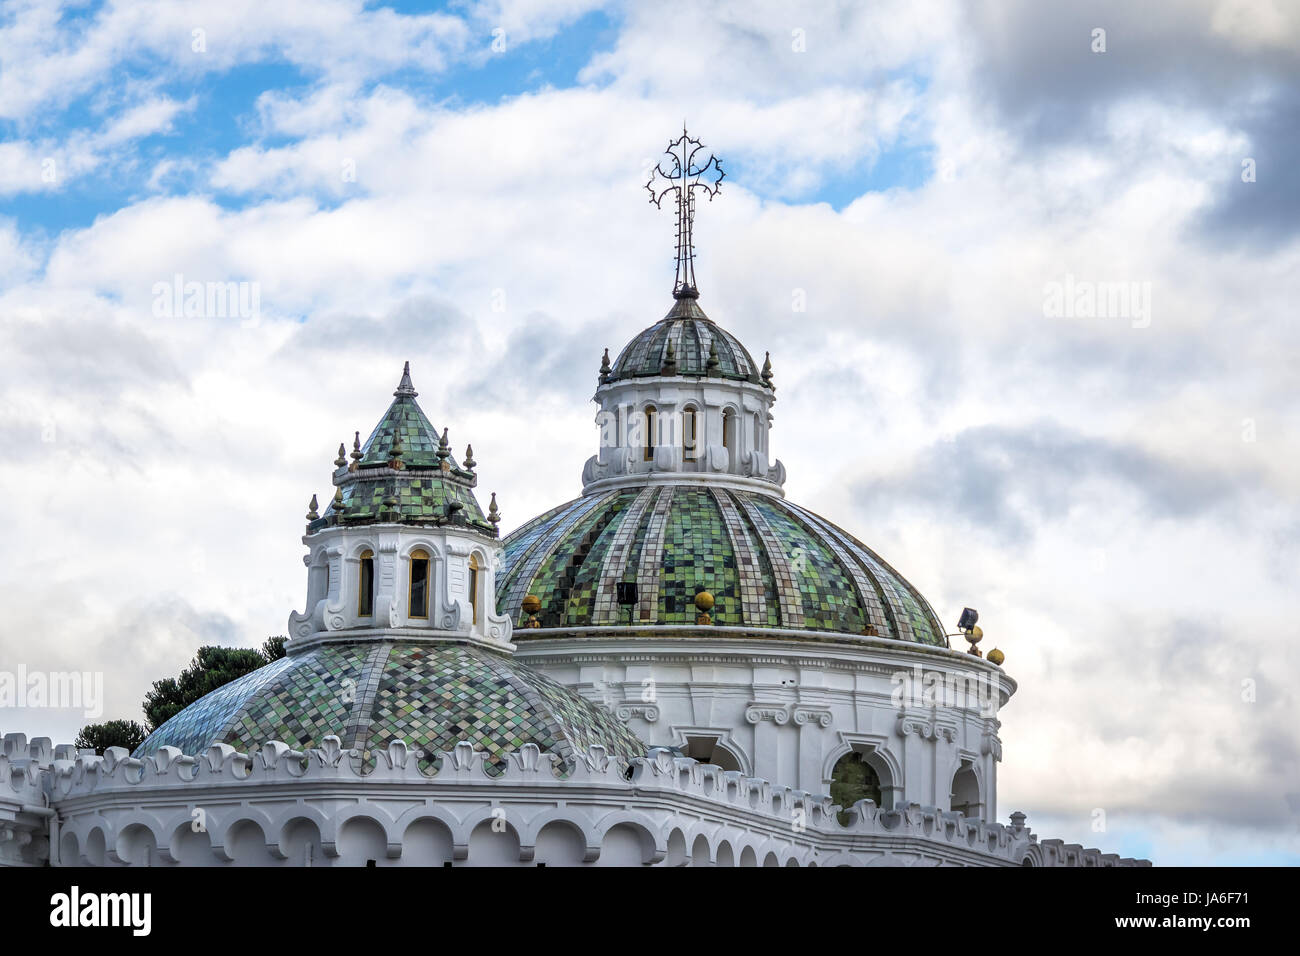 Kuppel der Kathedrale - Quito, Ecuador Stockbild